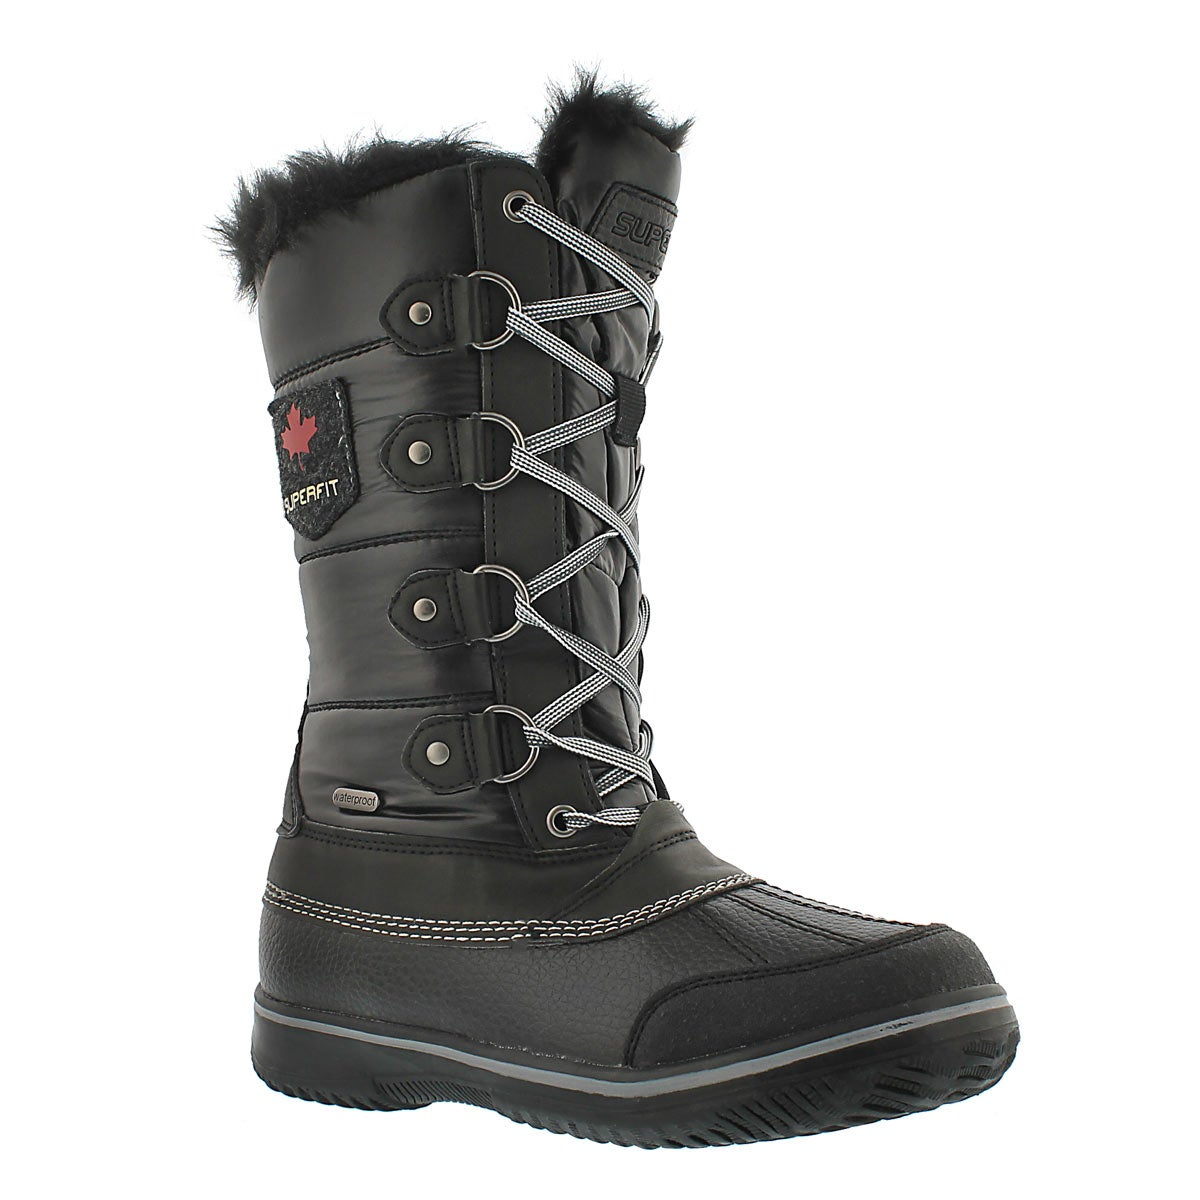 Lds Ulla blk wtrpf winter boot